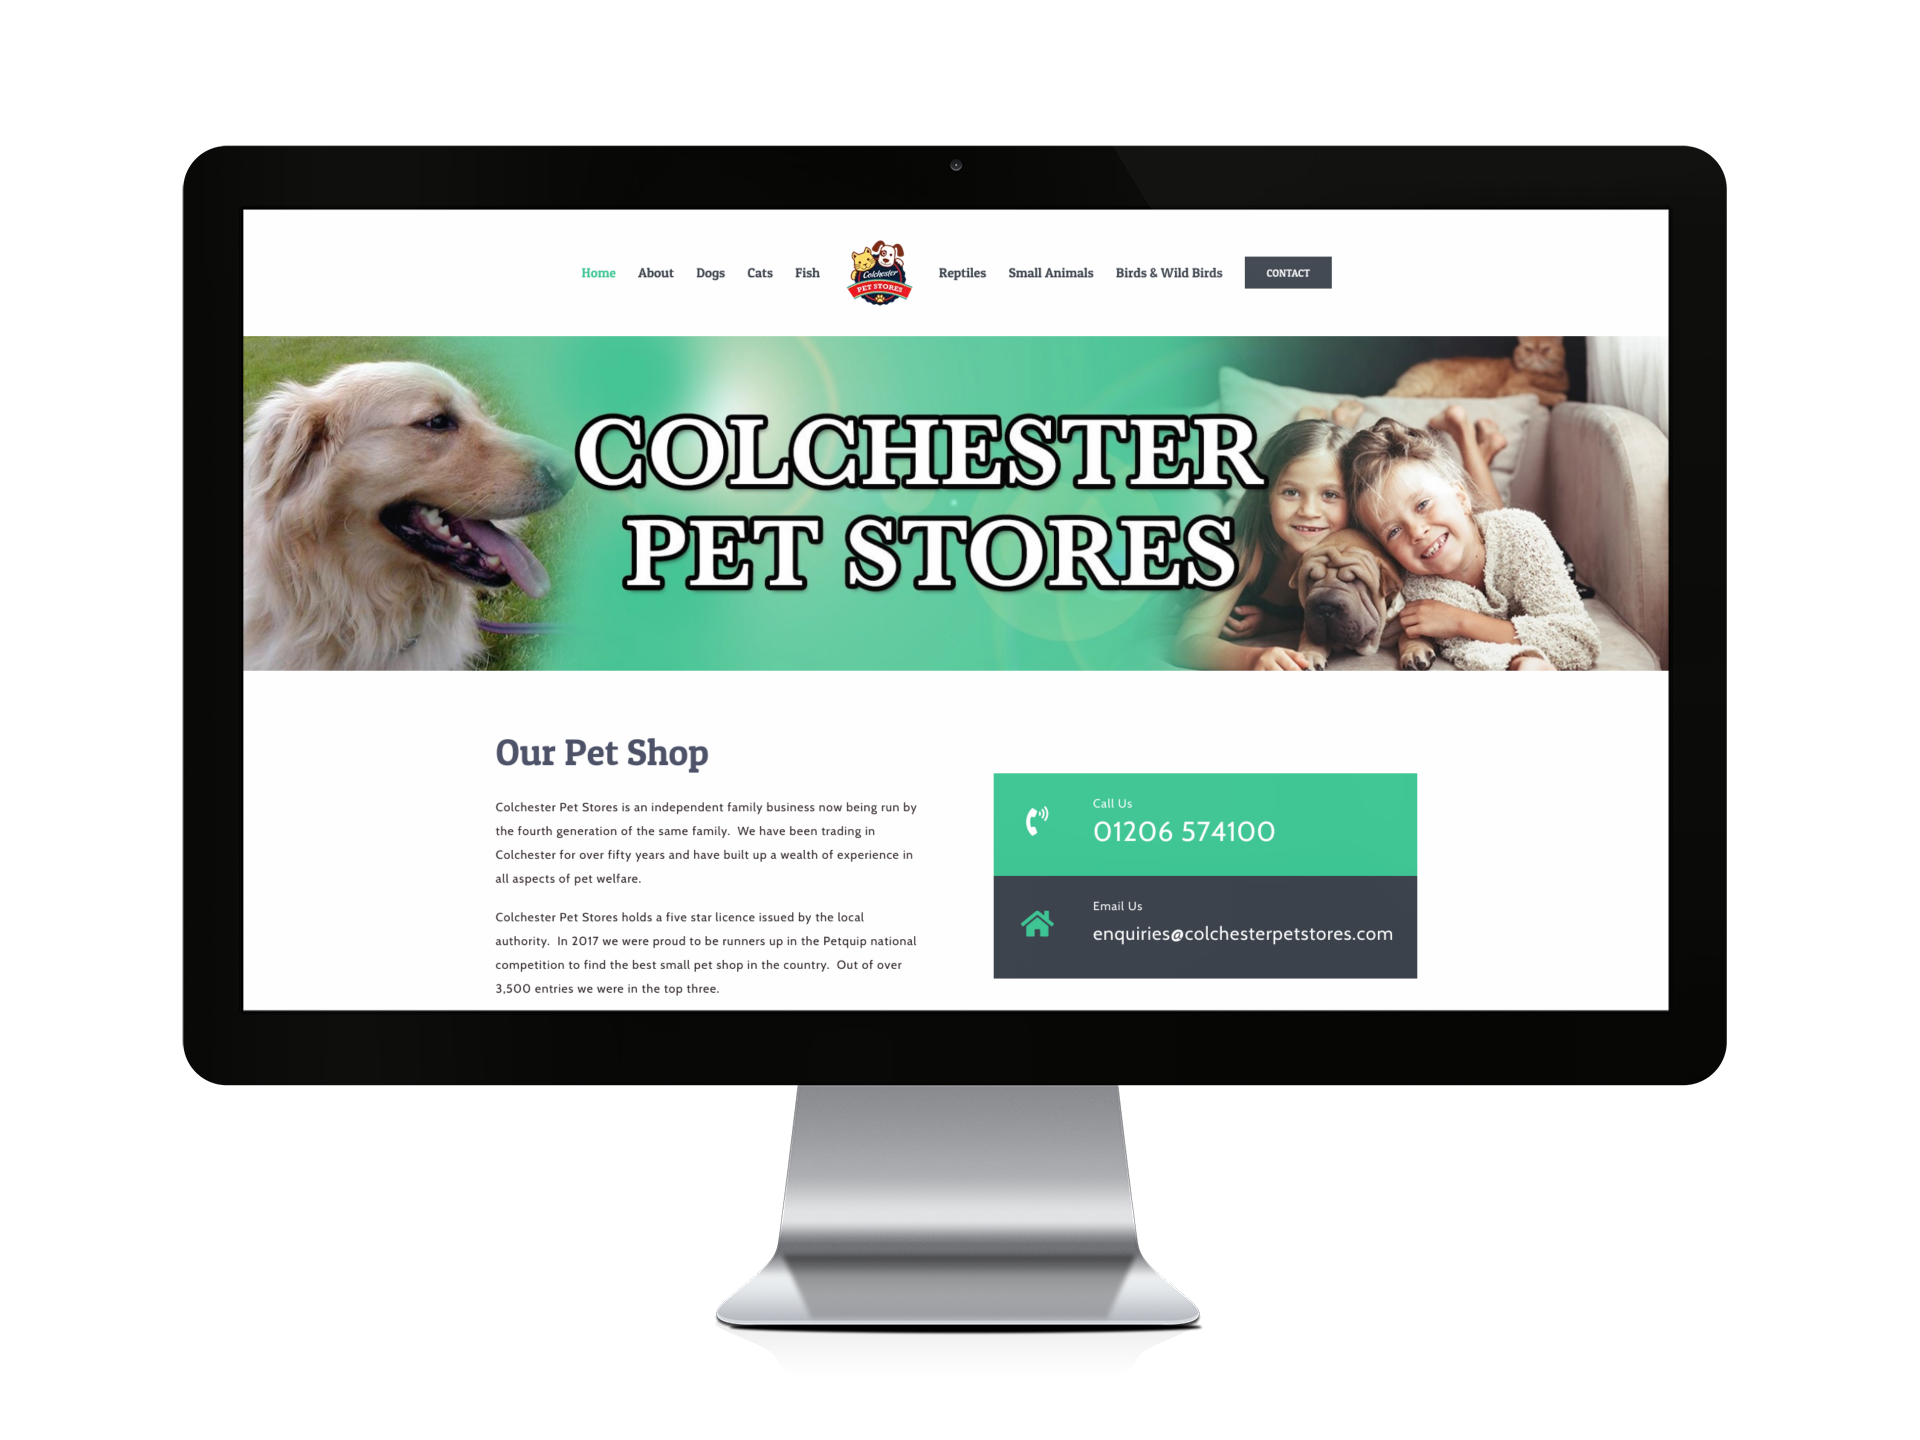 Colchester Pet Stores